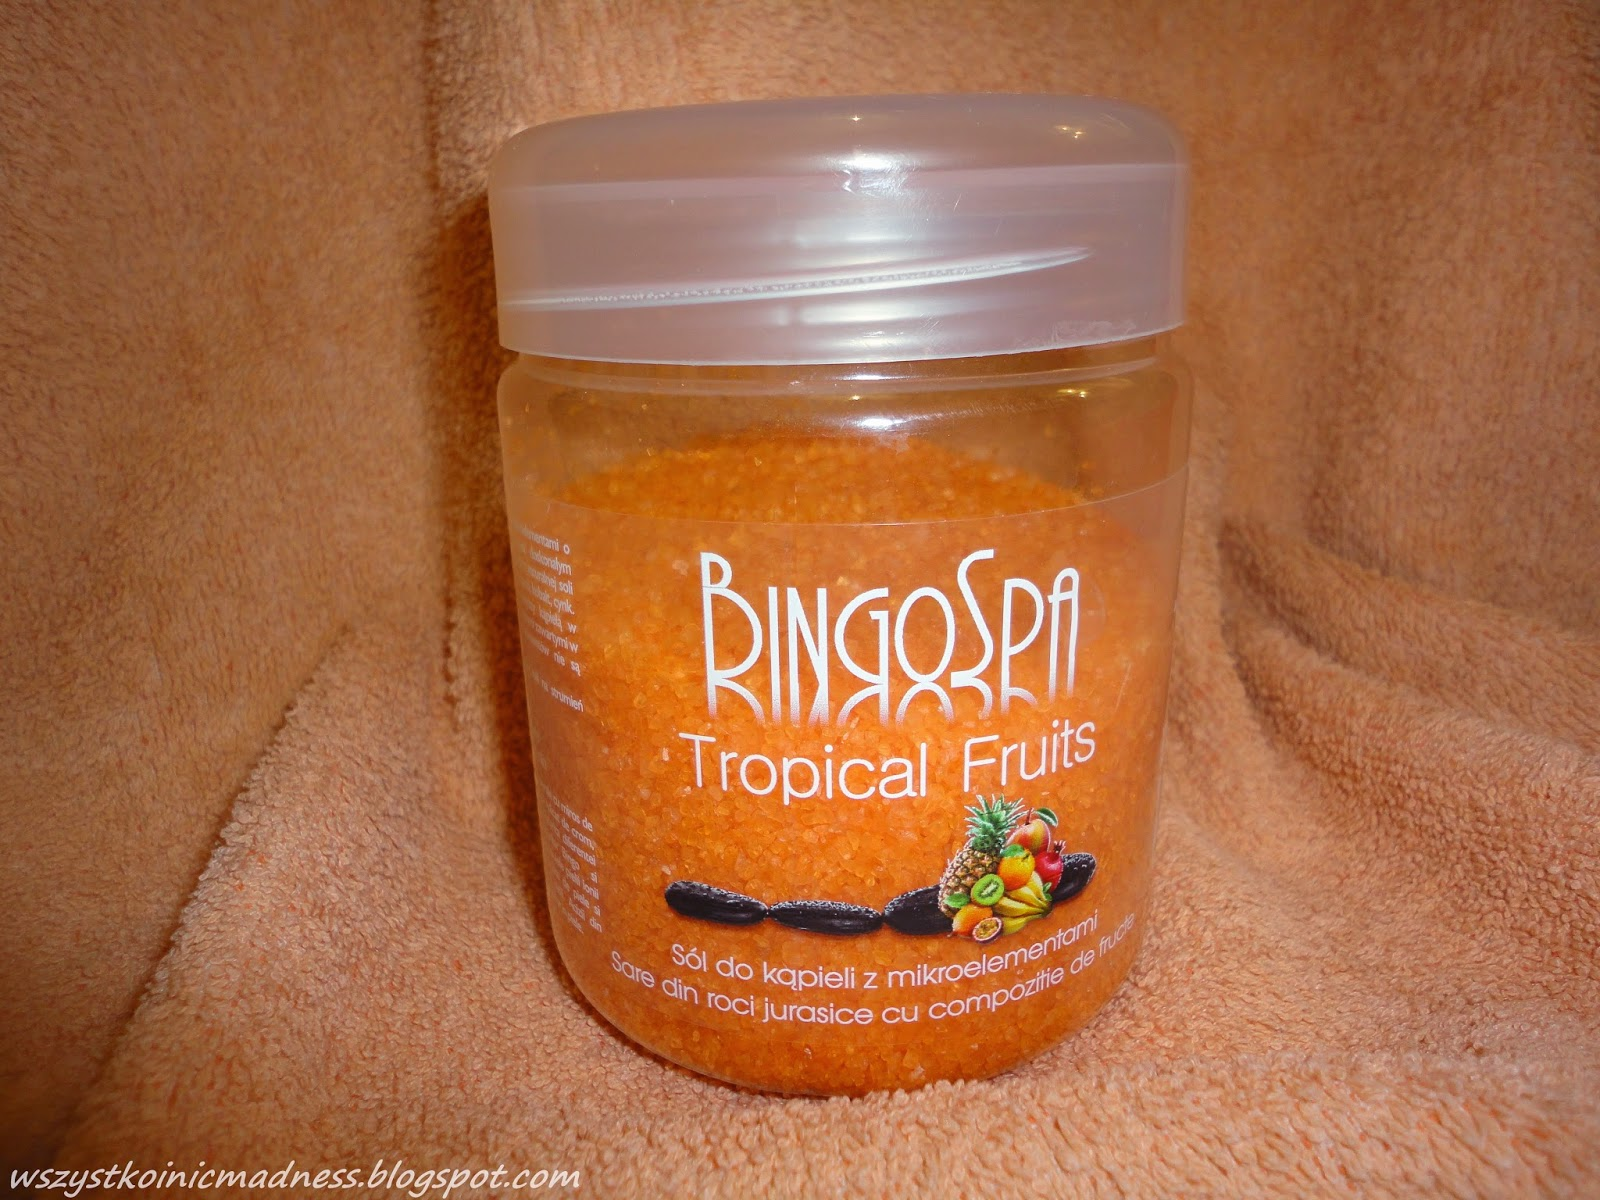 BingoSpa tropikalna sól do kąpieli z mikroelementami